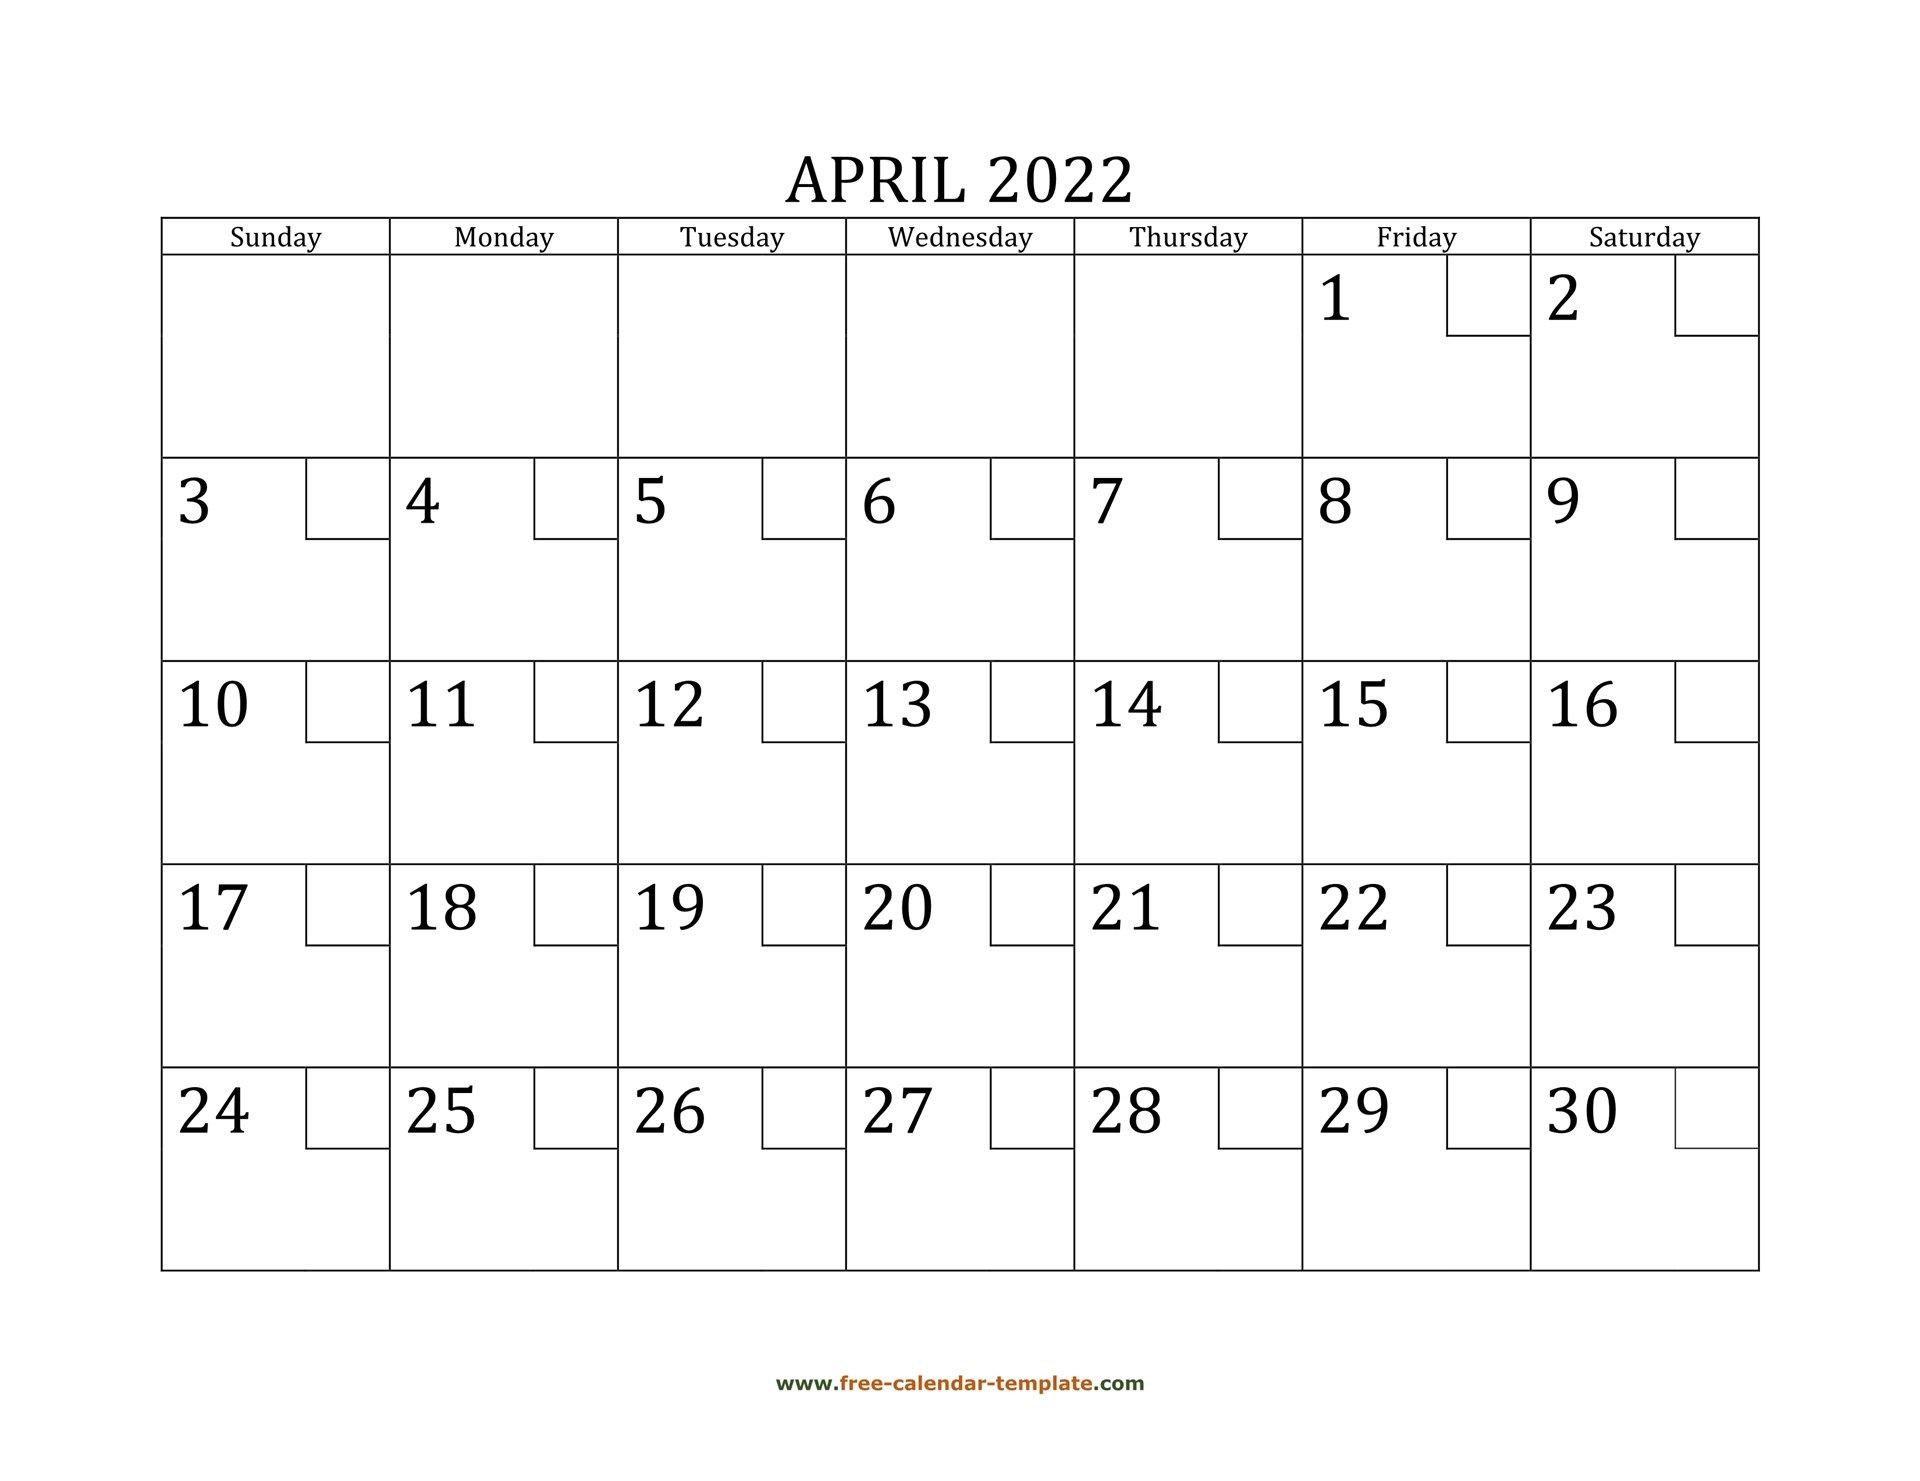 April 2022 Free Calendar Tempplate | Free-Calendar throughout Calendar April 2022 Printable Pdf